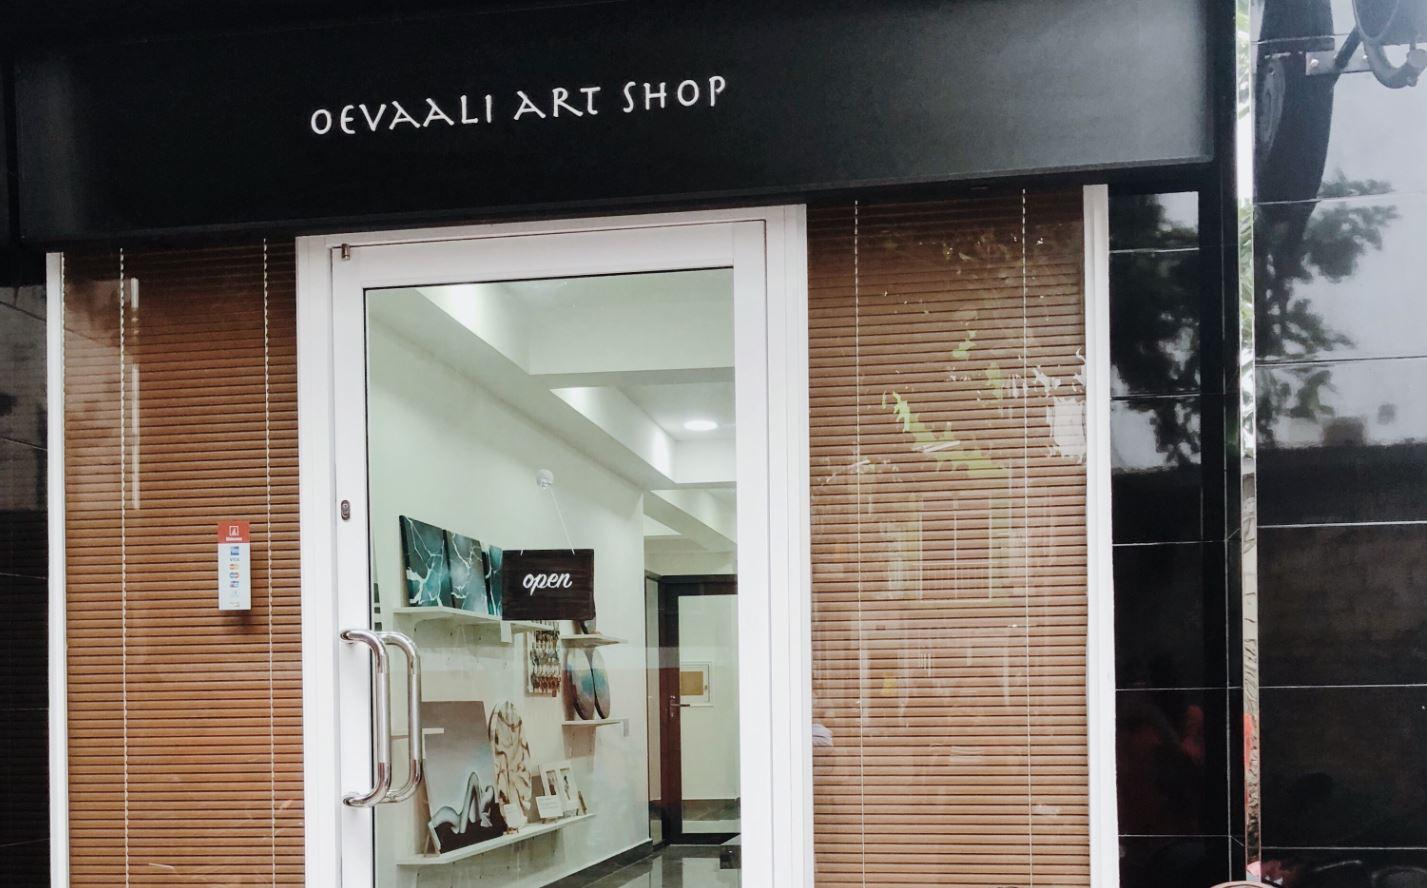 Oevaali Art Shop - Best Place to Shop in Maldives